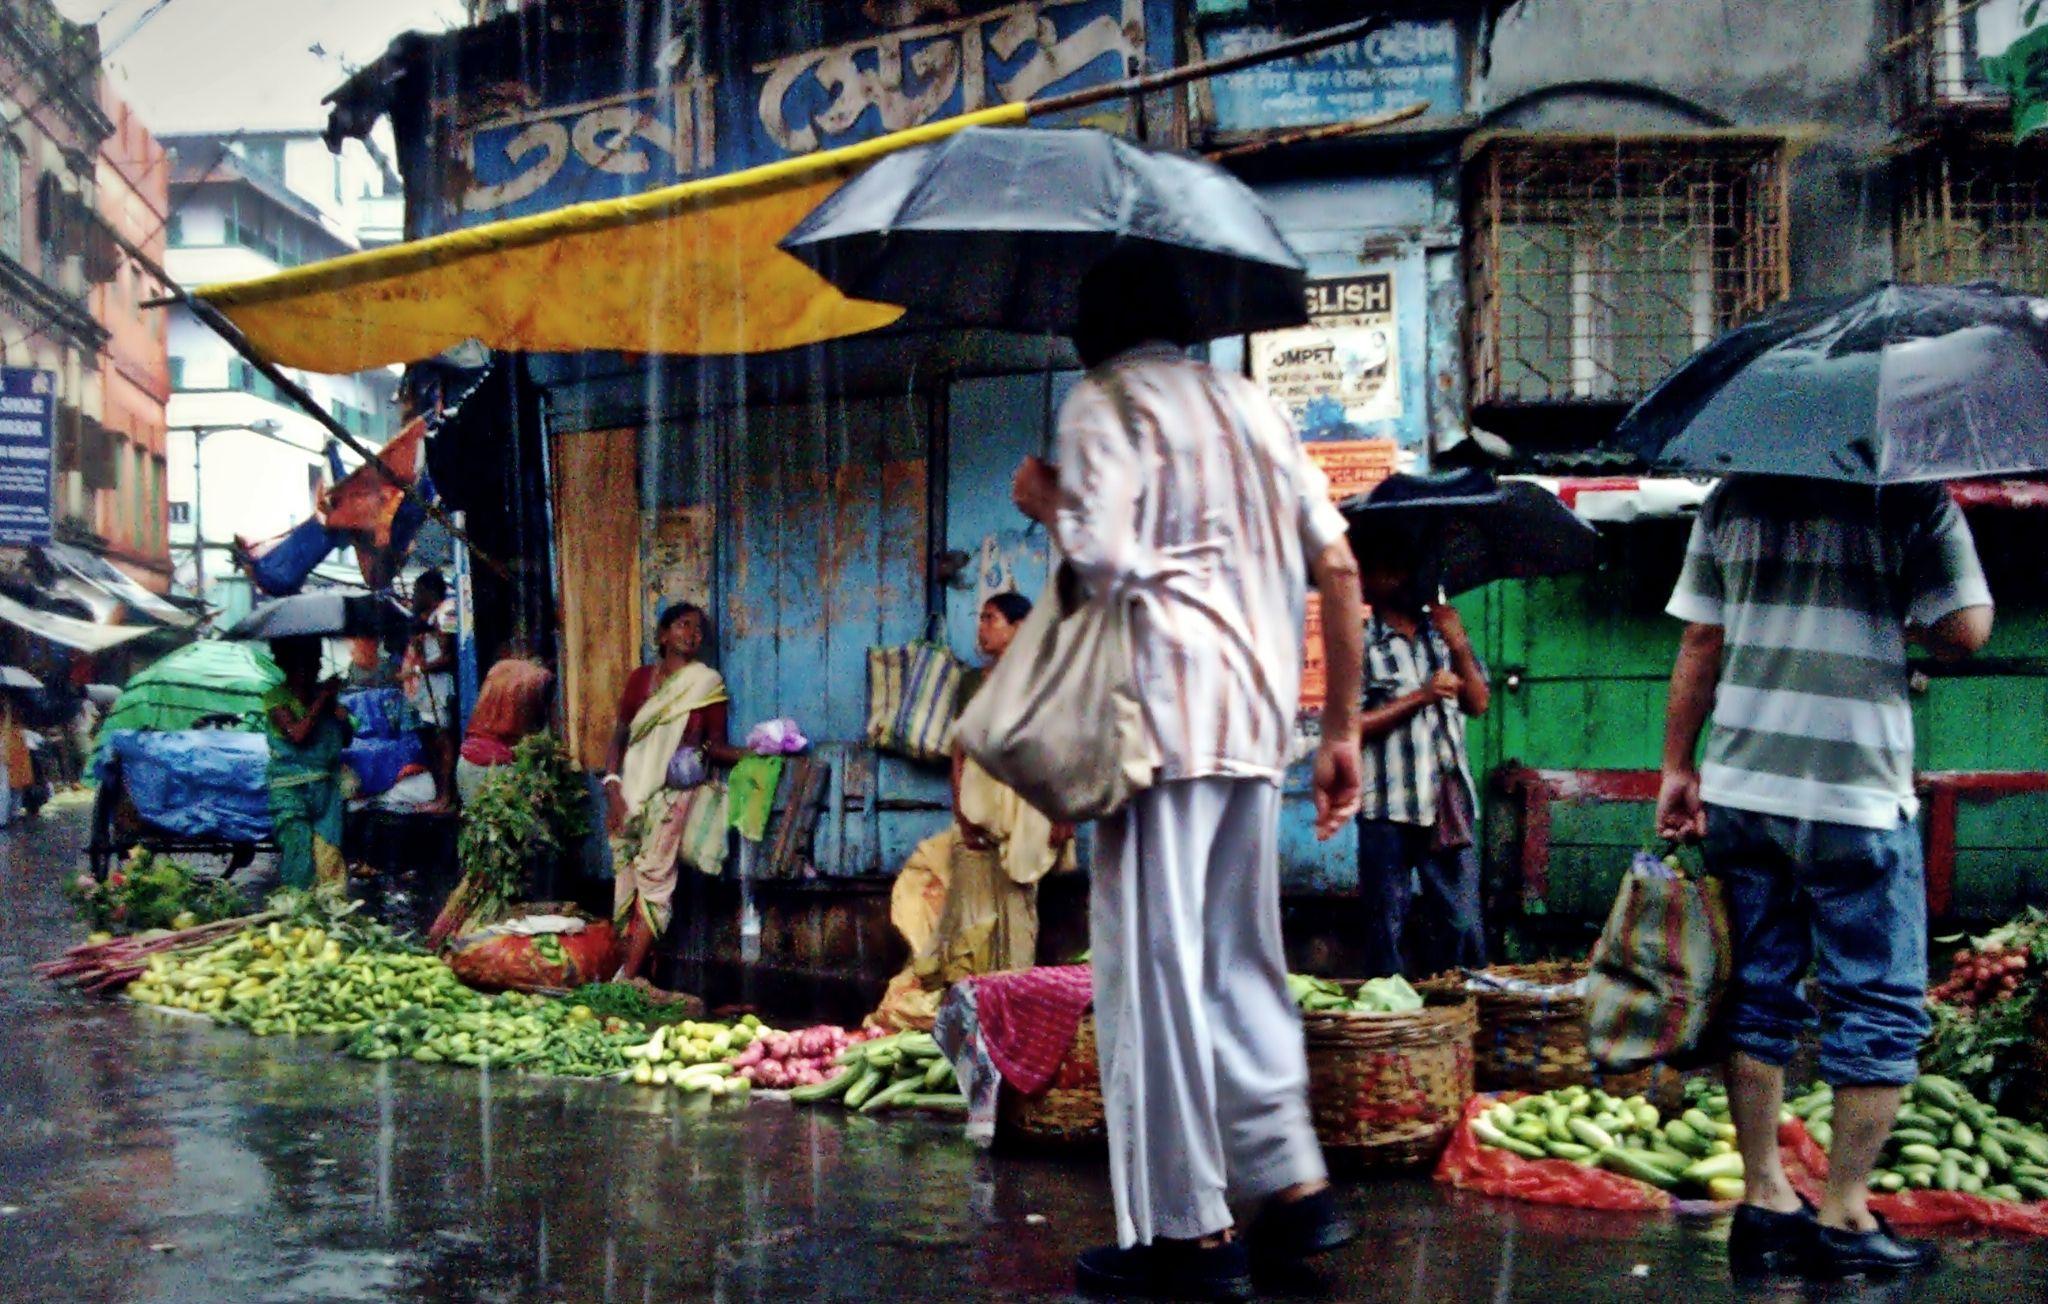 Busy Market by Abhishek Sarkar